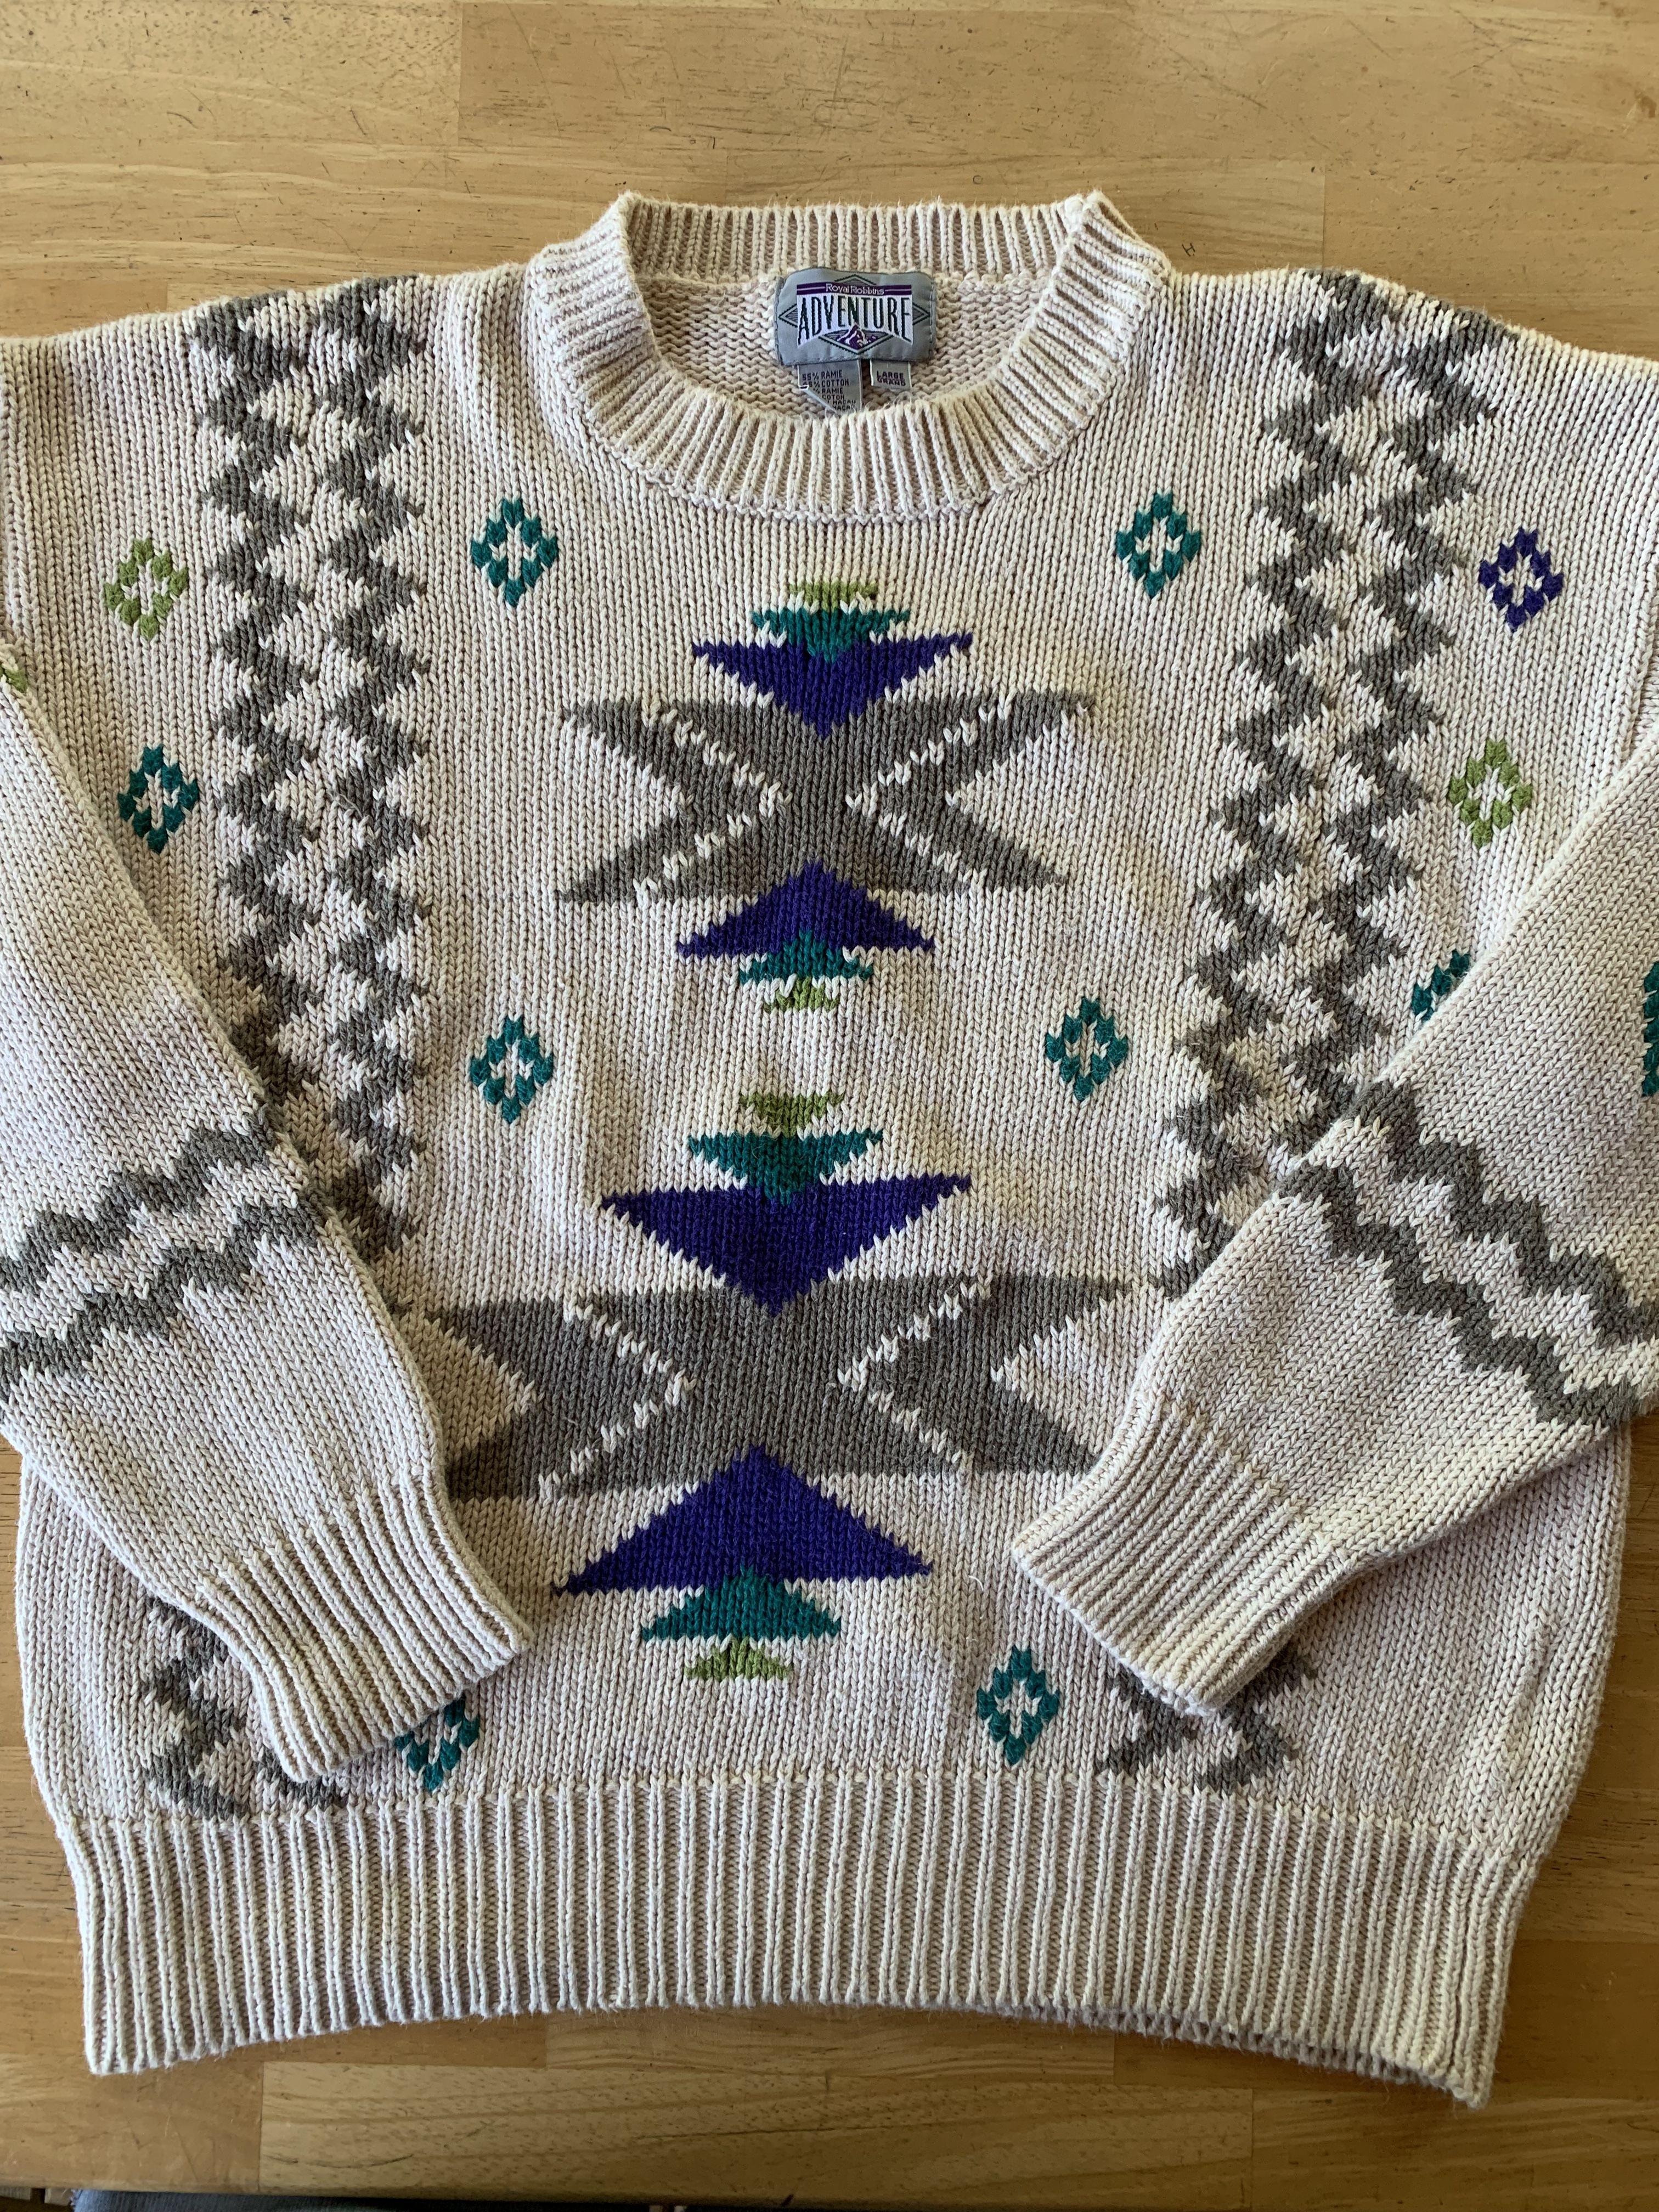 Vintage 80s 90s Geometric Pattern Heavy Knit Ski Sweater Size XL BEAUTIFUL